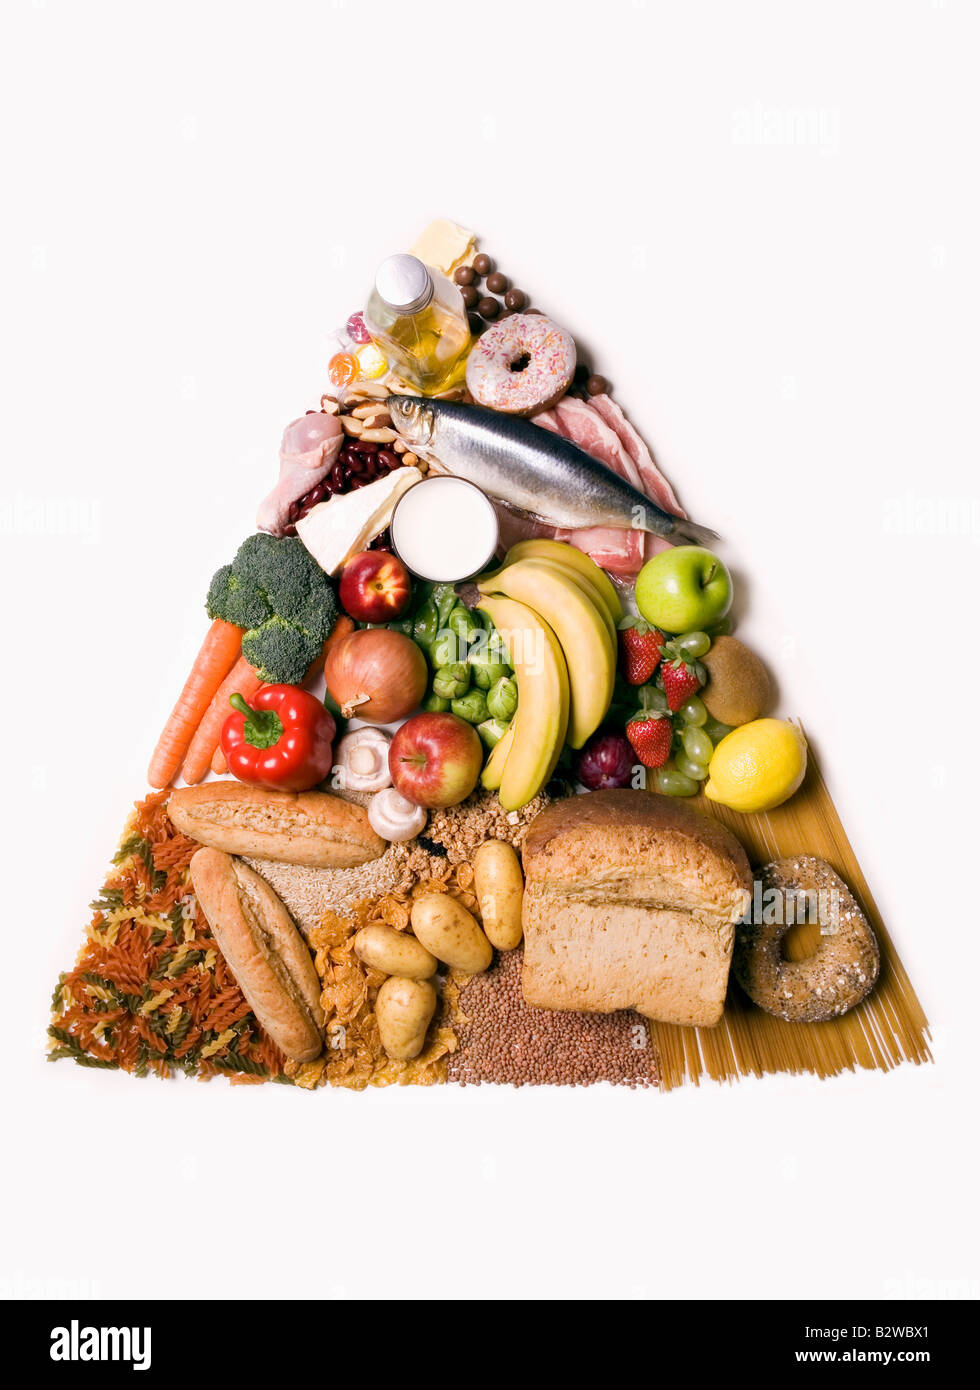 Food pyramid - Stock Image